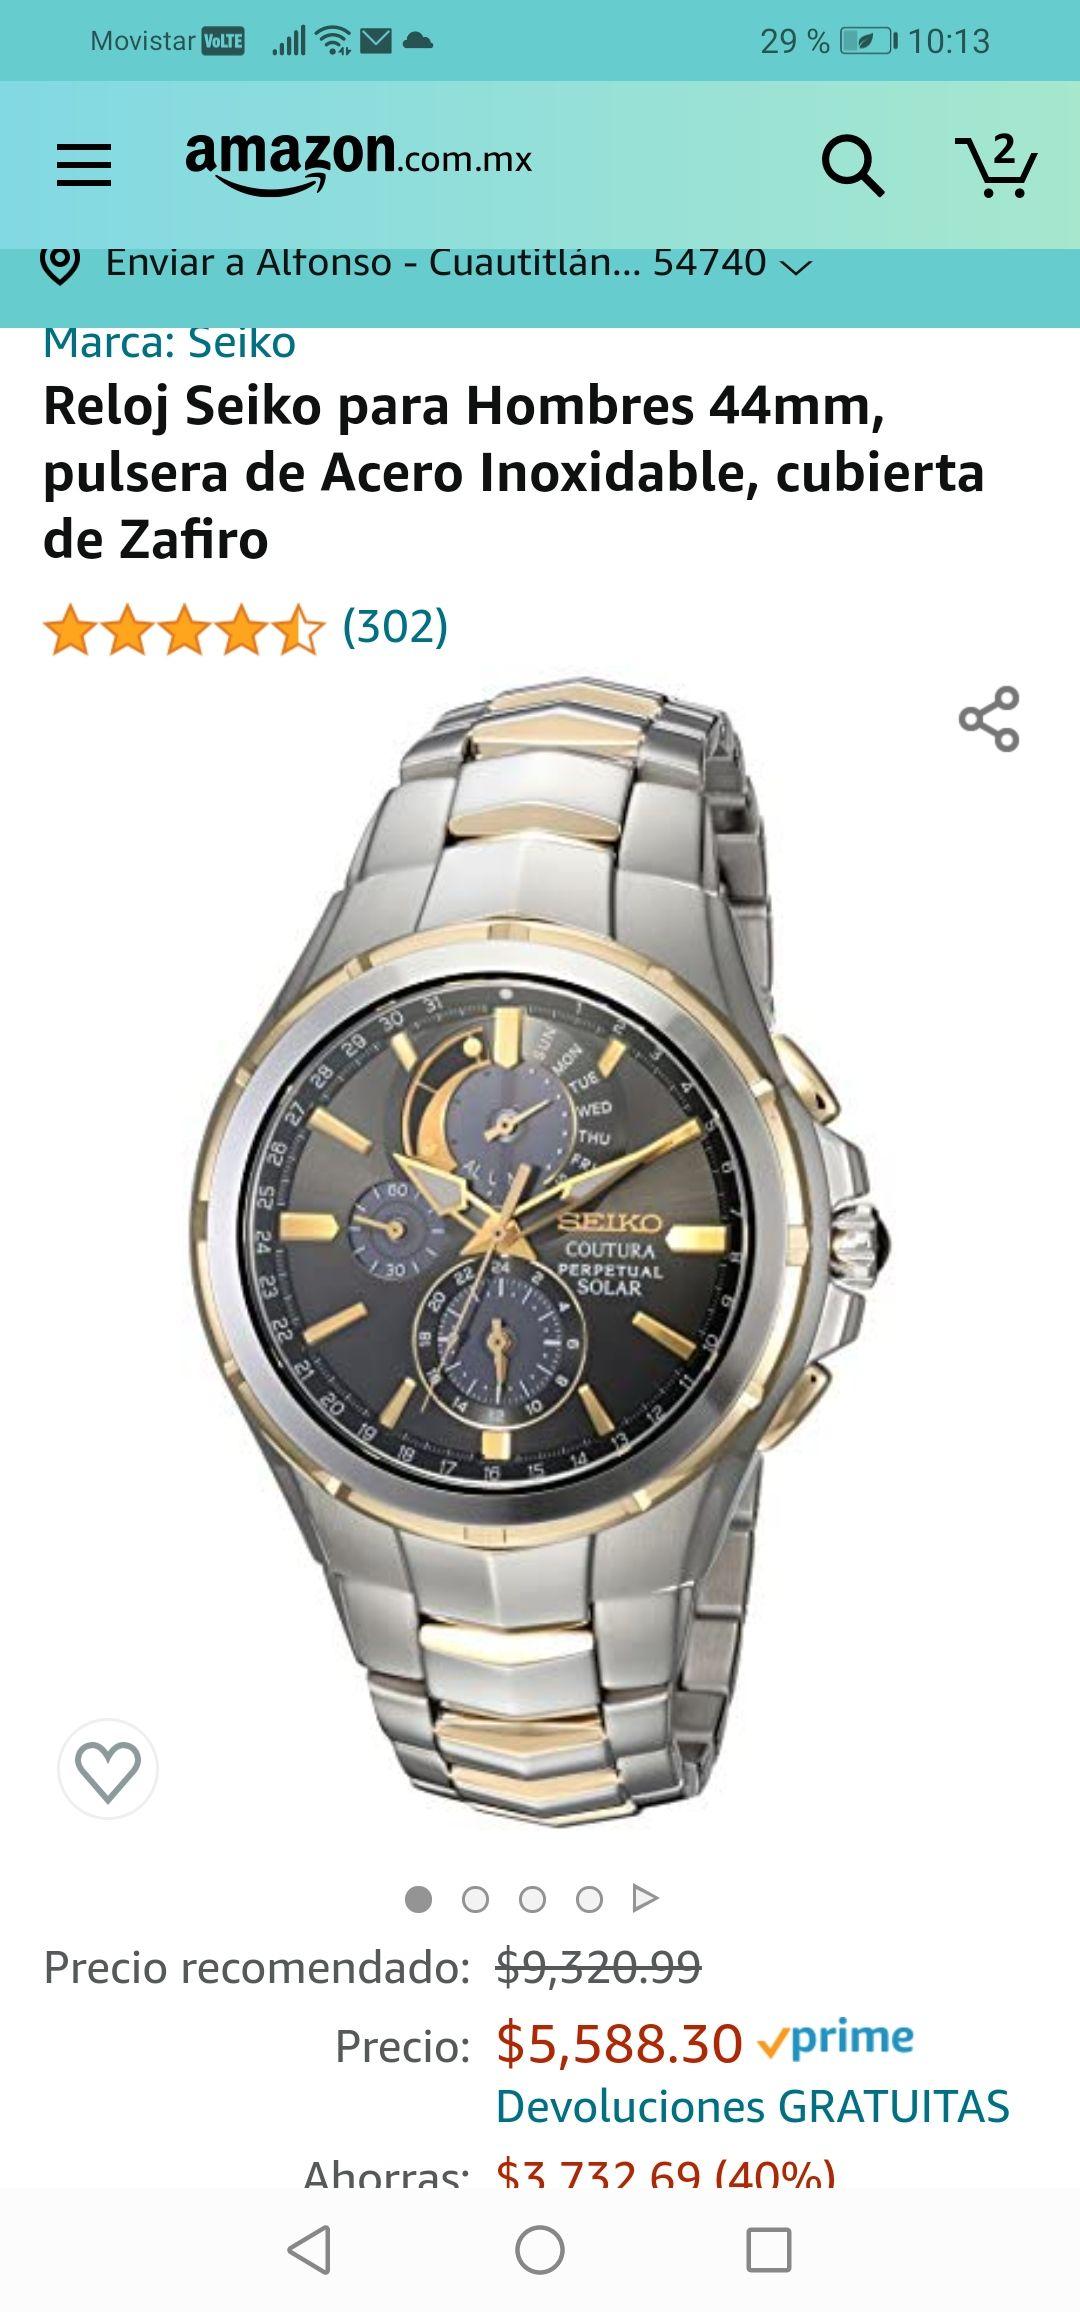 Amazon :Reloj Seiko para Hombres 44mm, pulsera de Acero Inoxidable, cubierta de Zafiro